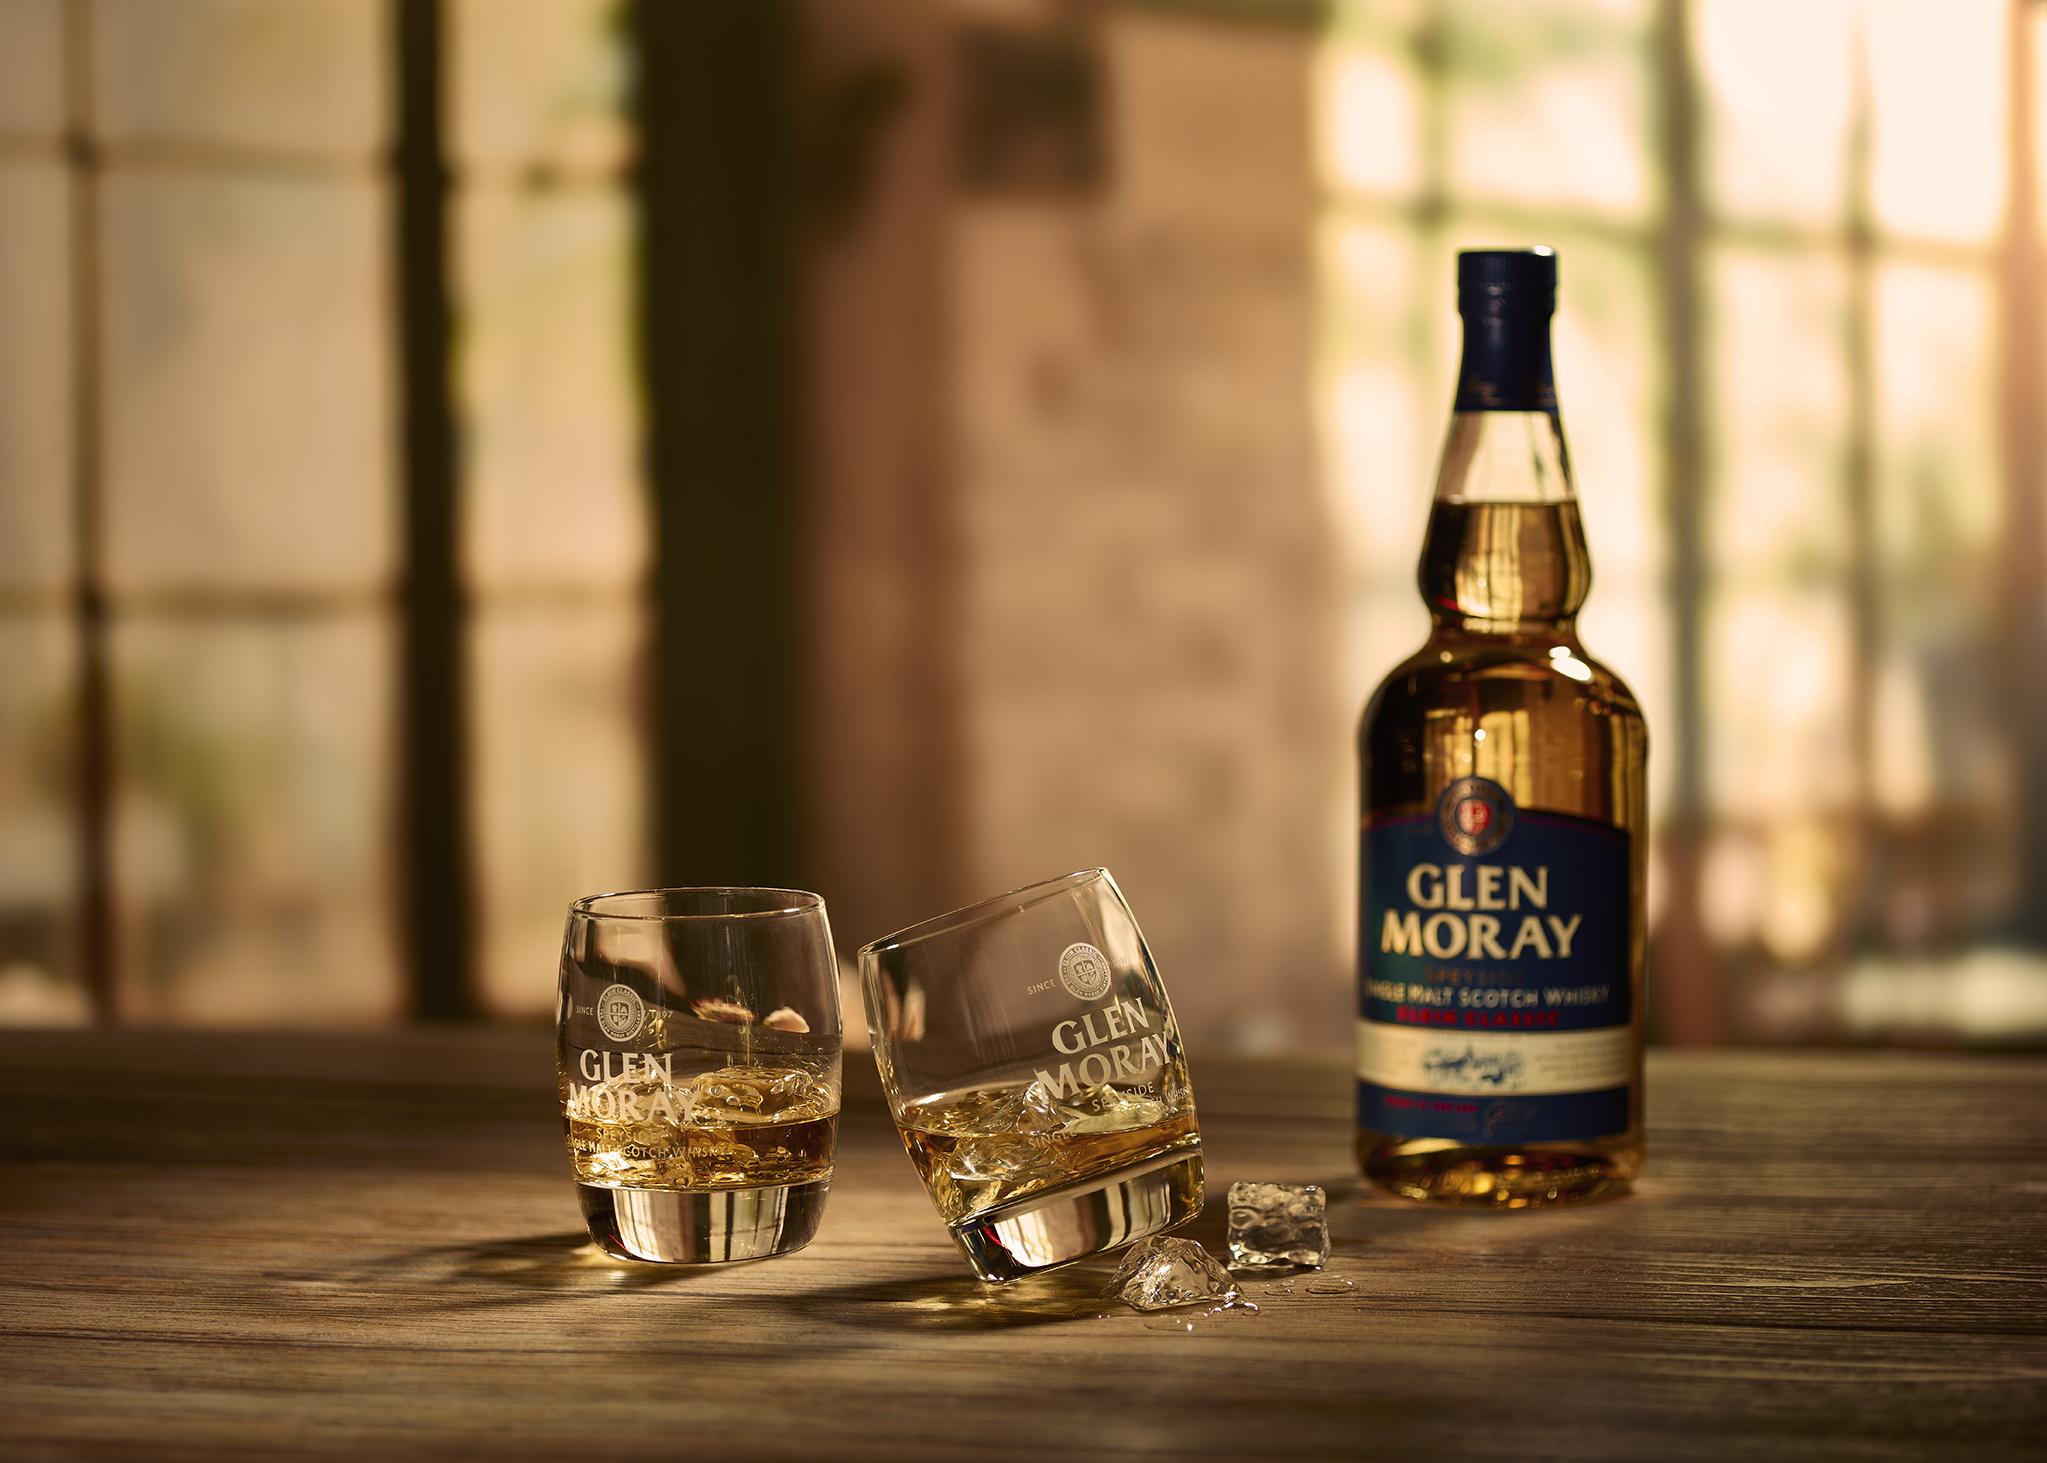 Glen Moray Classic Lifestyle